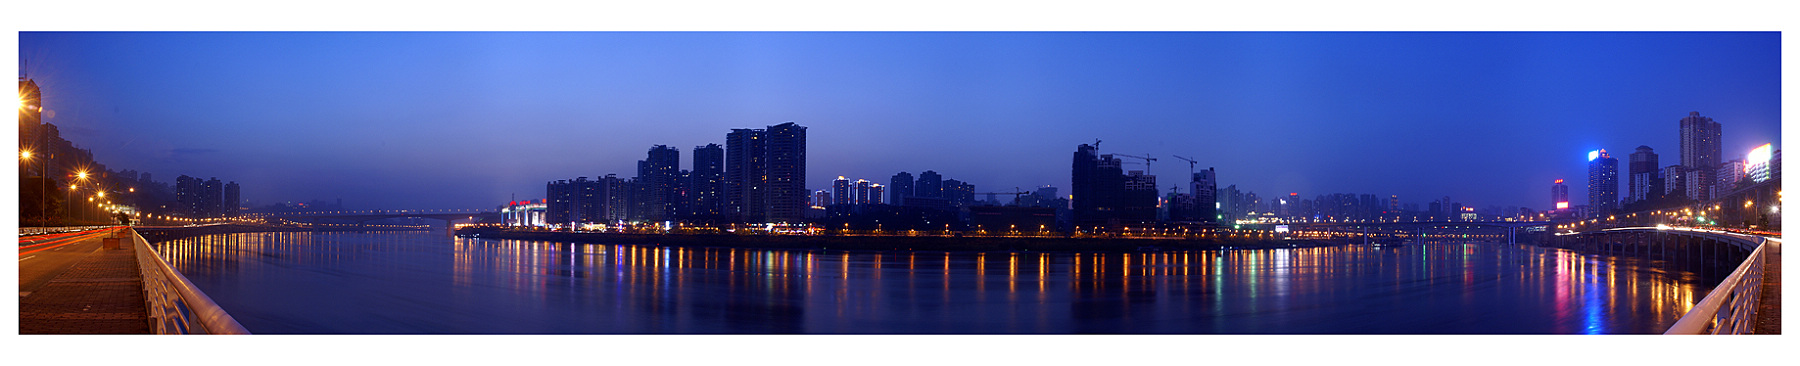 cityanimal作品:山城夜景之江北